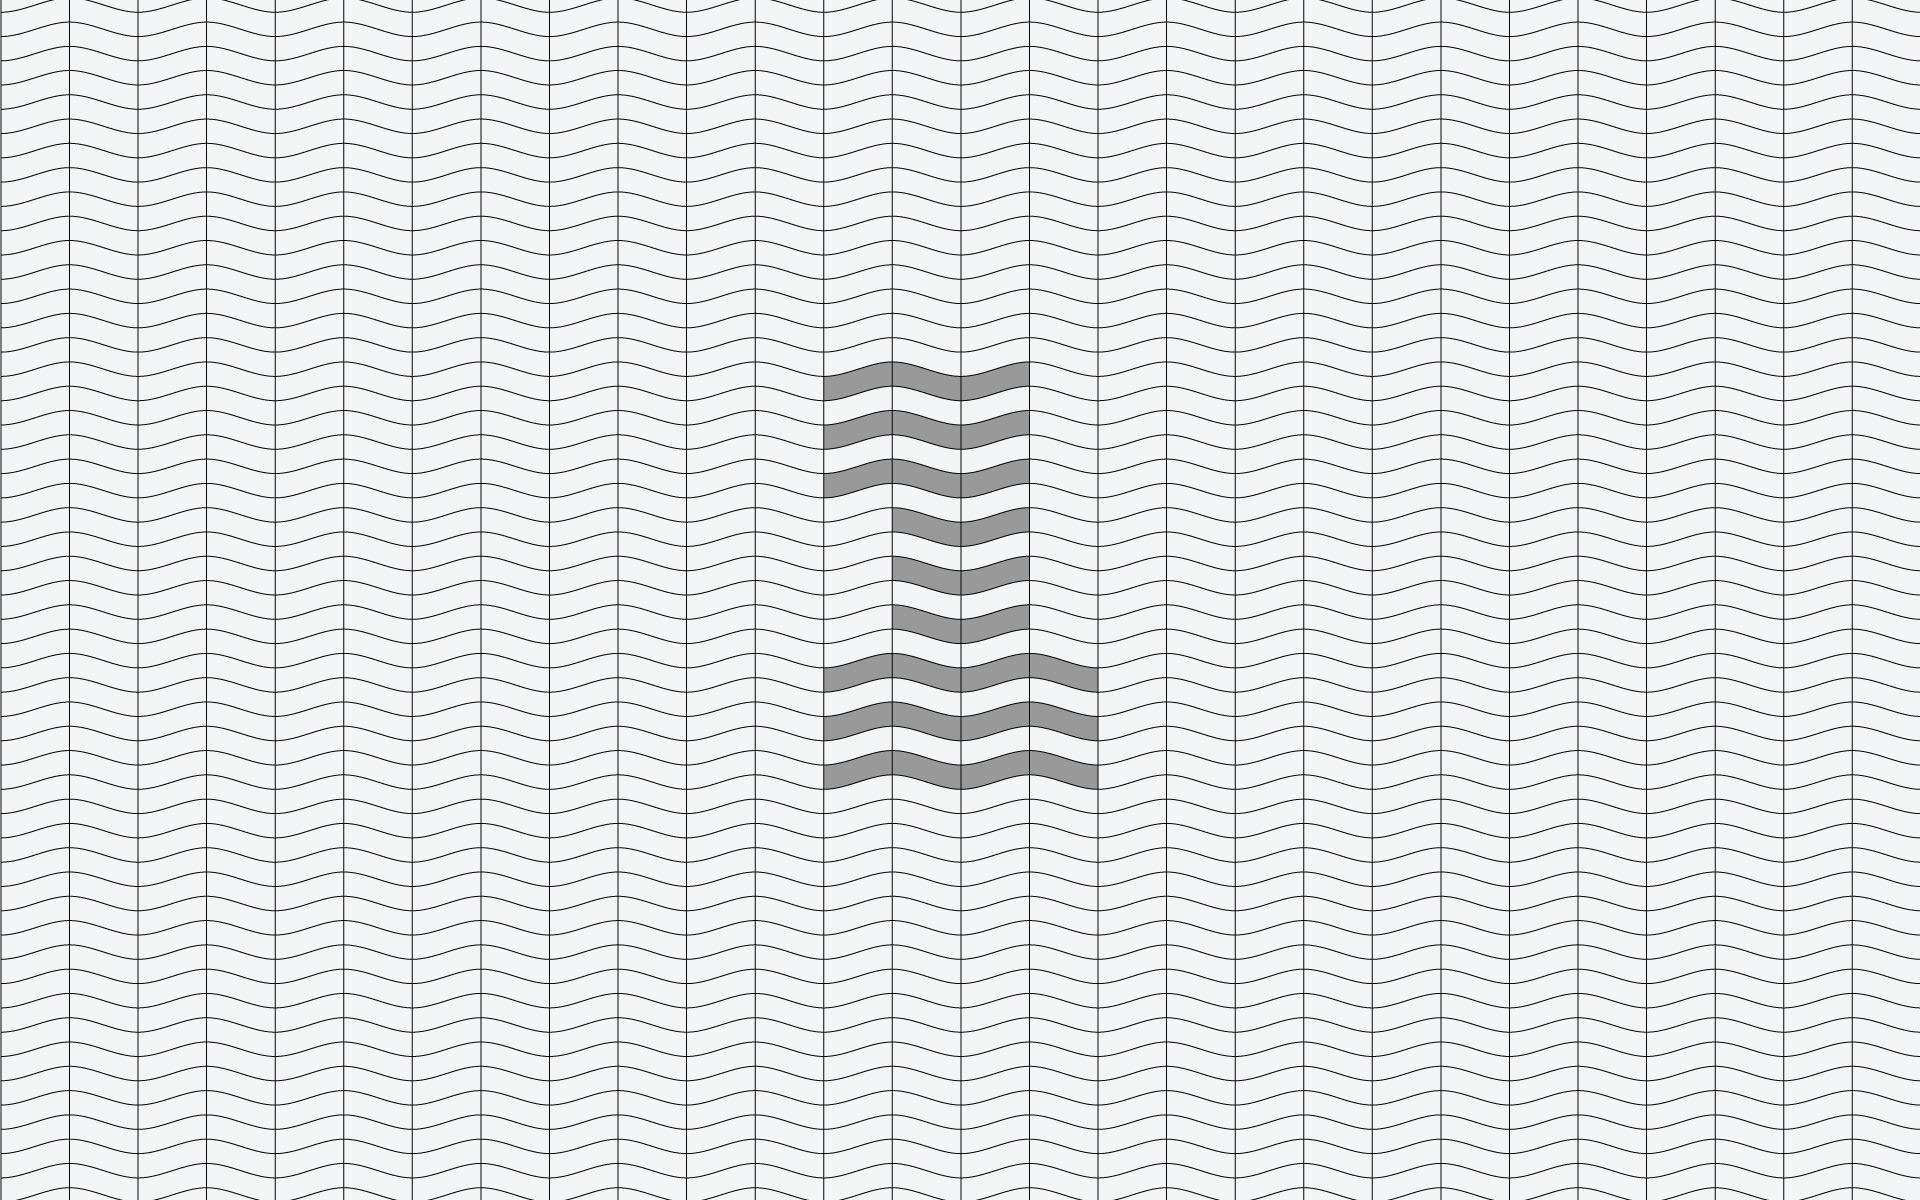 1-River-Music-Festival-Brand-Identity-Design-11